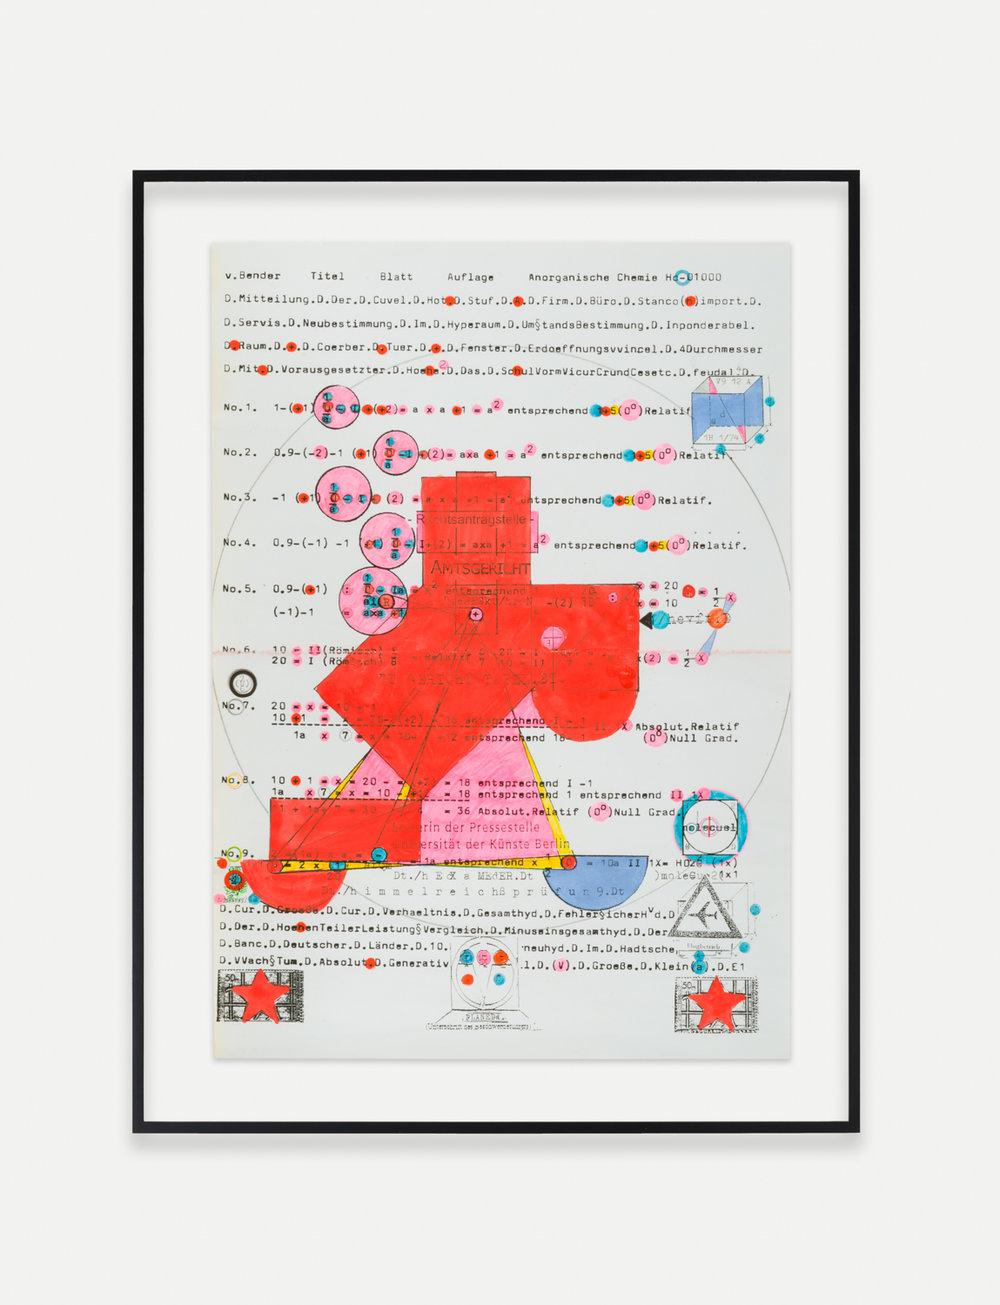 Adelhyd van Bender Untitled 1999-2014 16.5 x 11.75 in (41.91h x 29.85w cm) AVB008